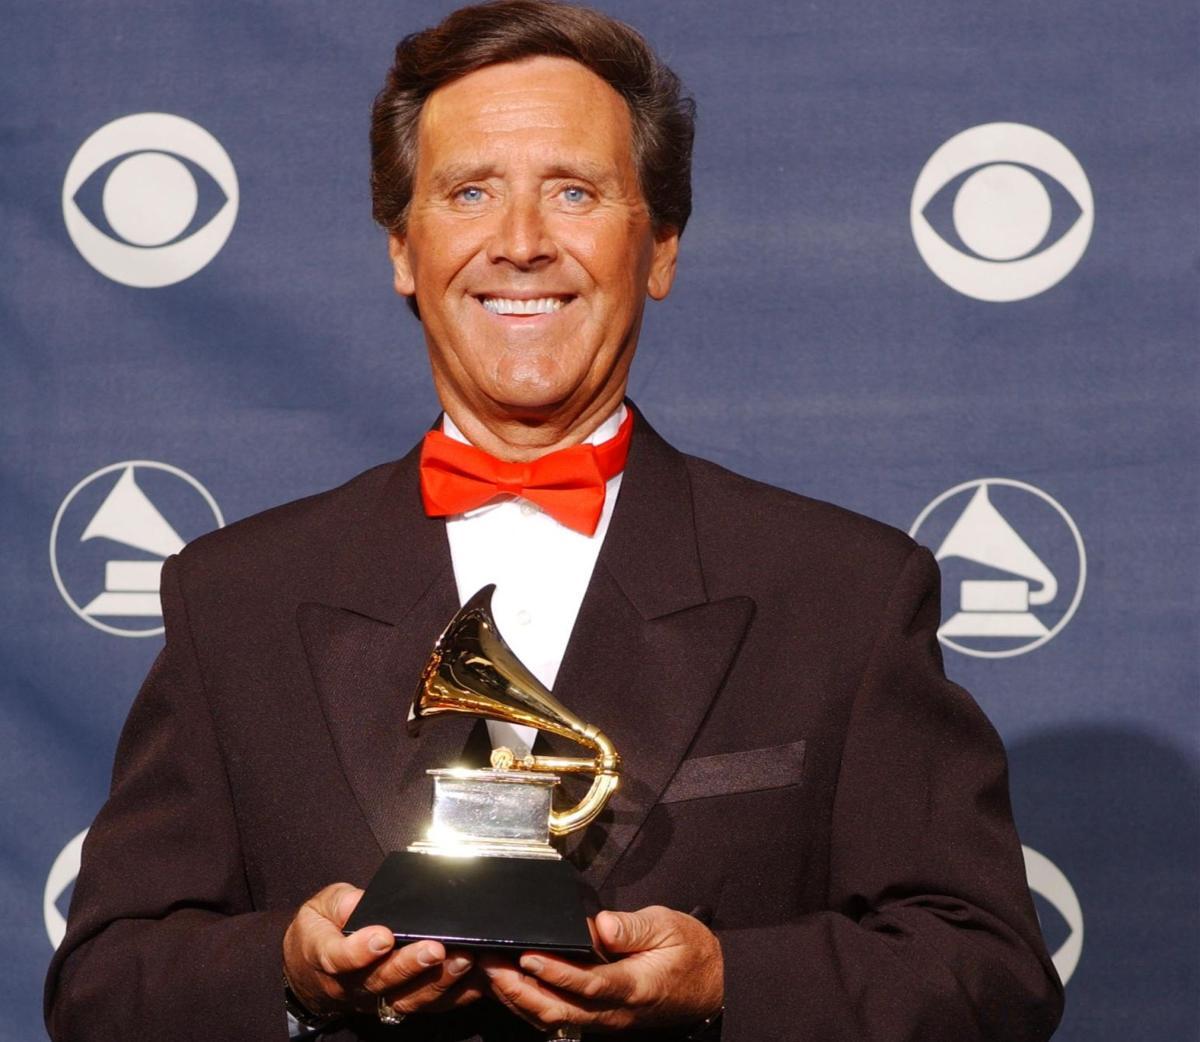 Jimmy Sturr 45th Annual Grammy Awards Pre-Telecast Pressroom